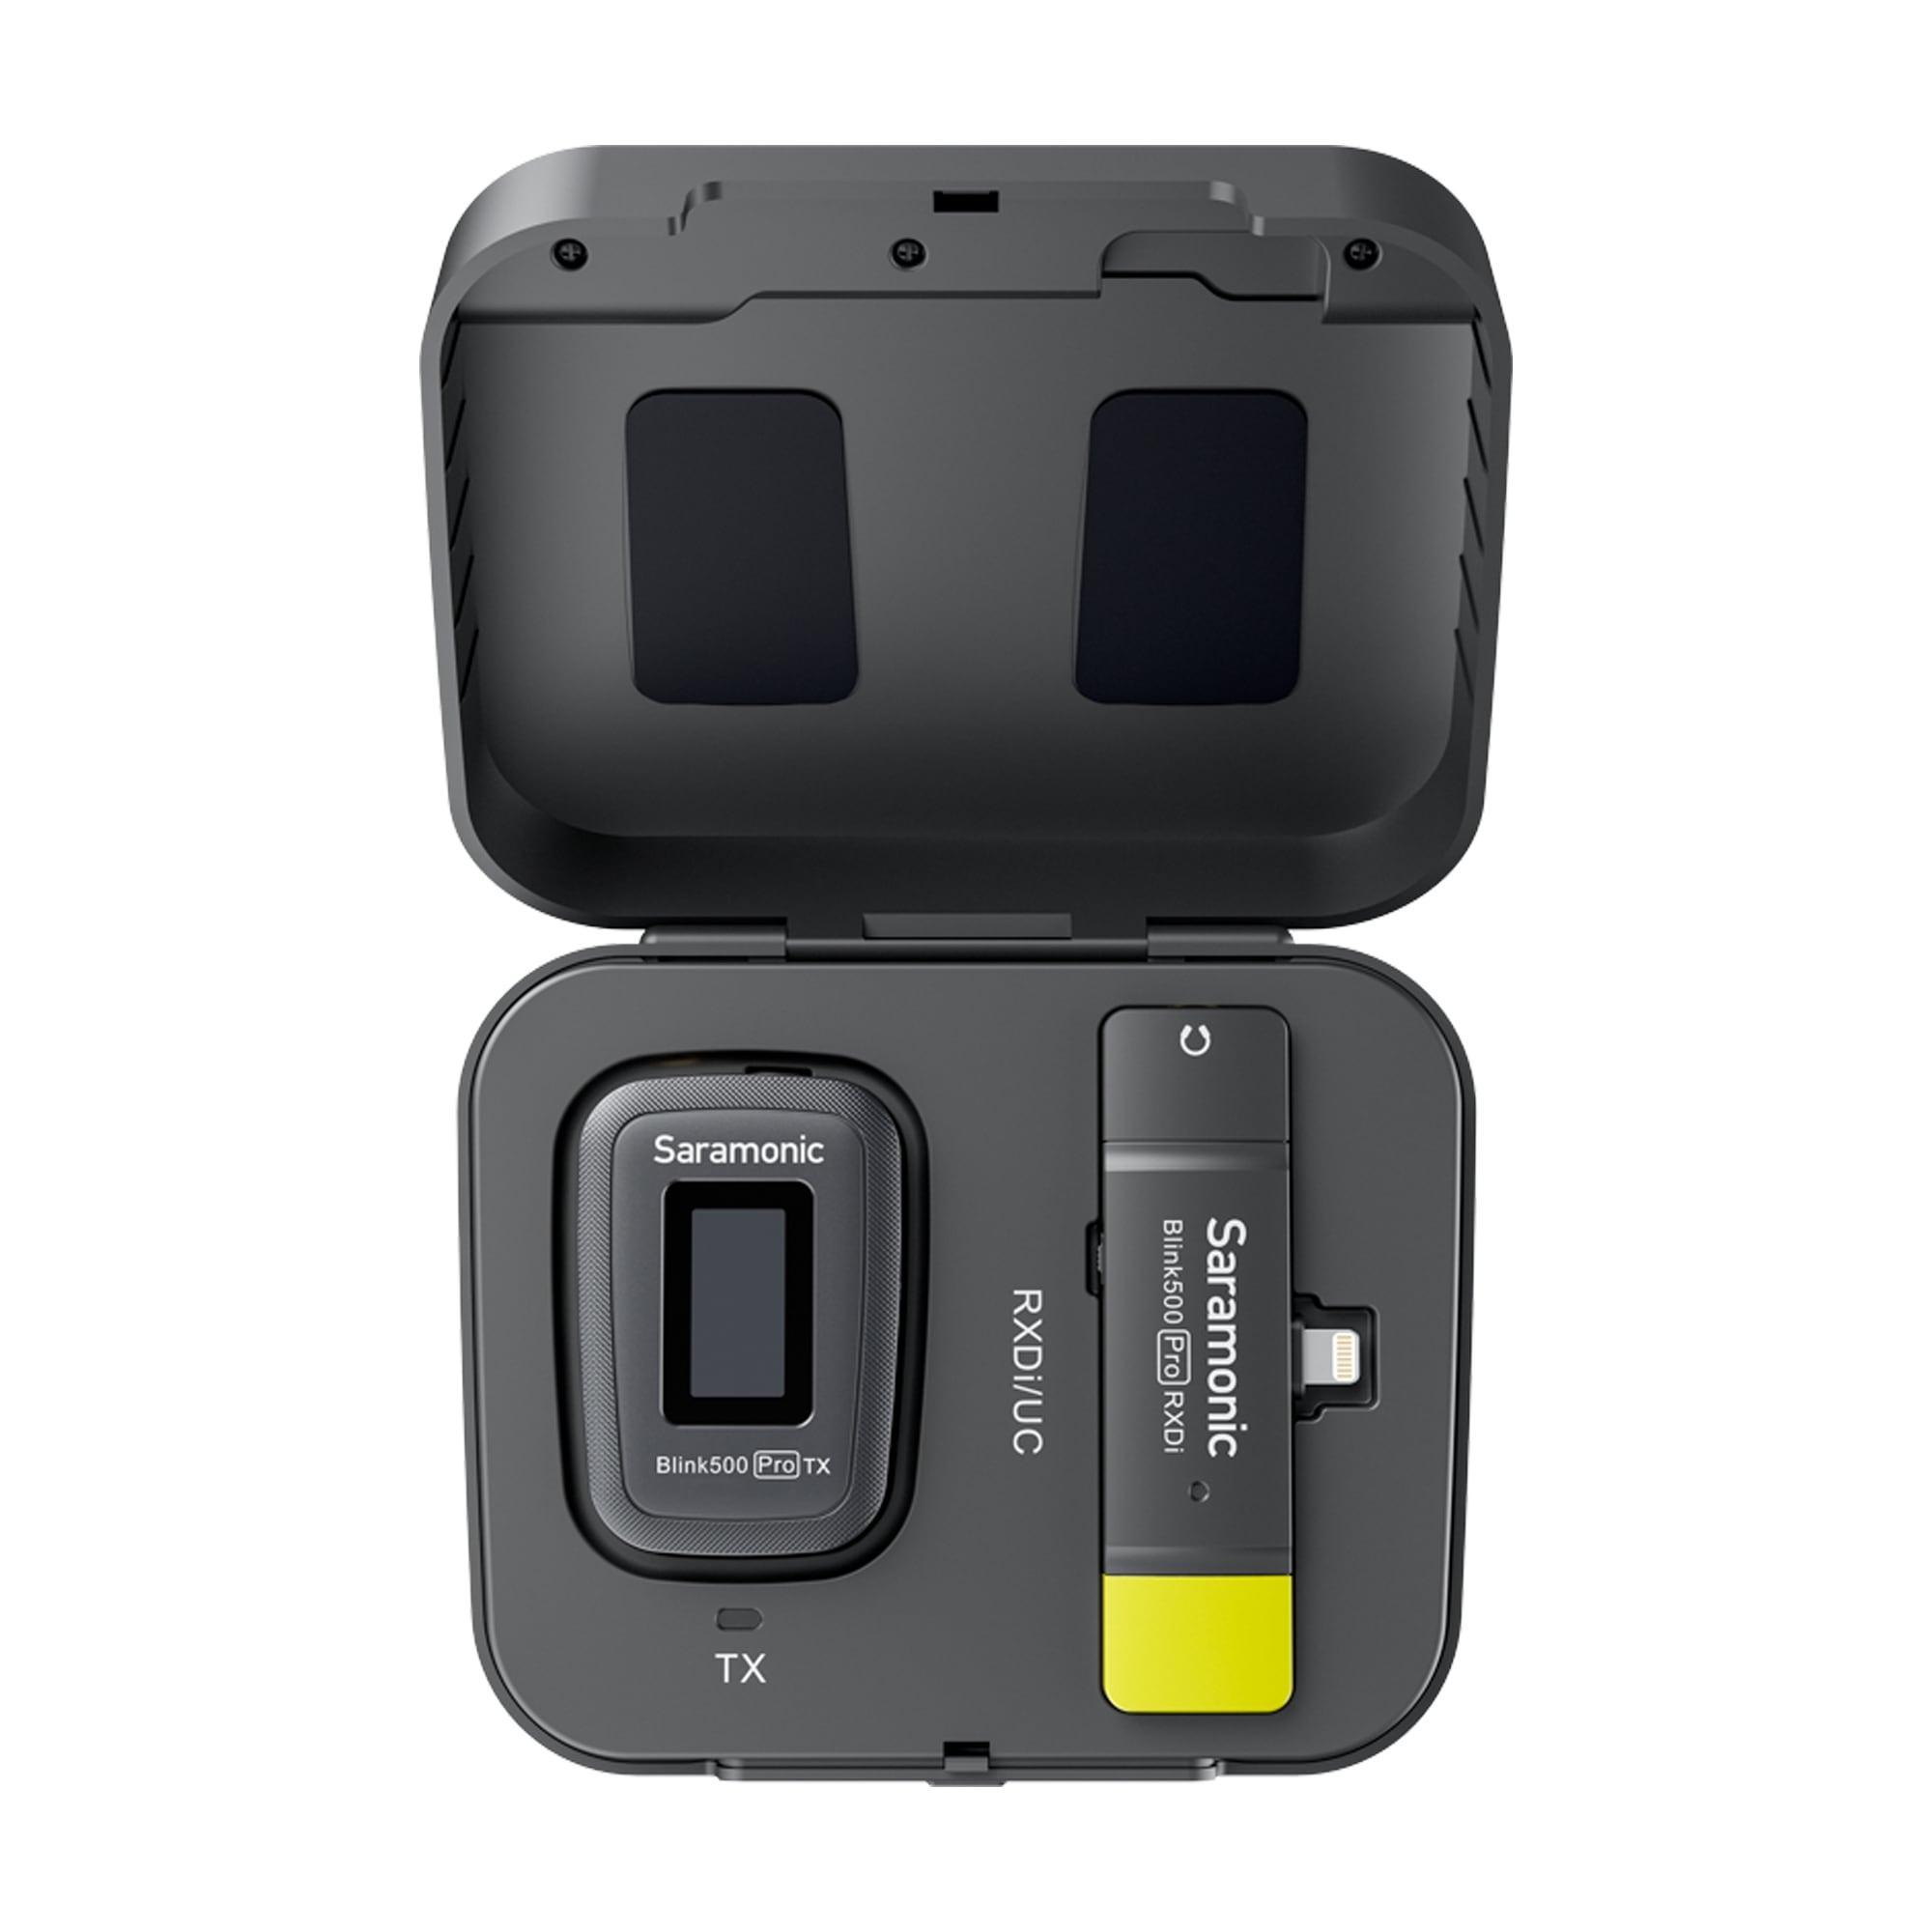 Saramonic Blink 500 Pro B3 2,4GHz wireless w/ Lightning